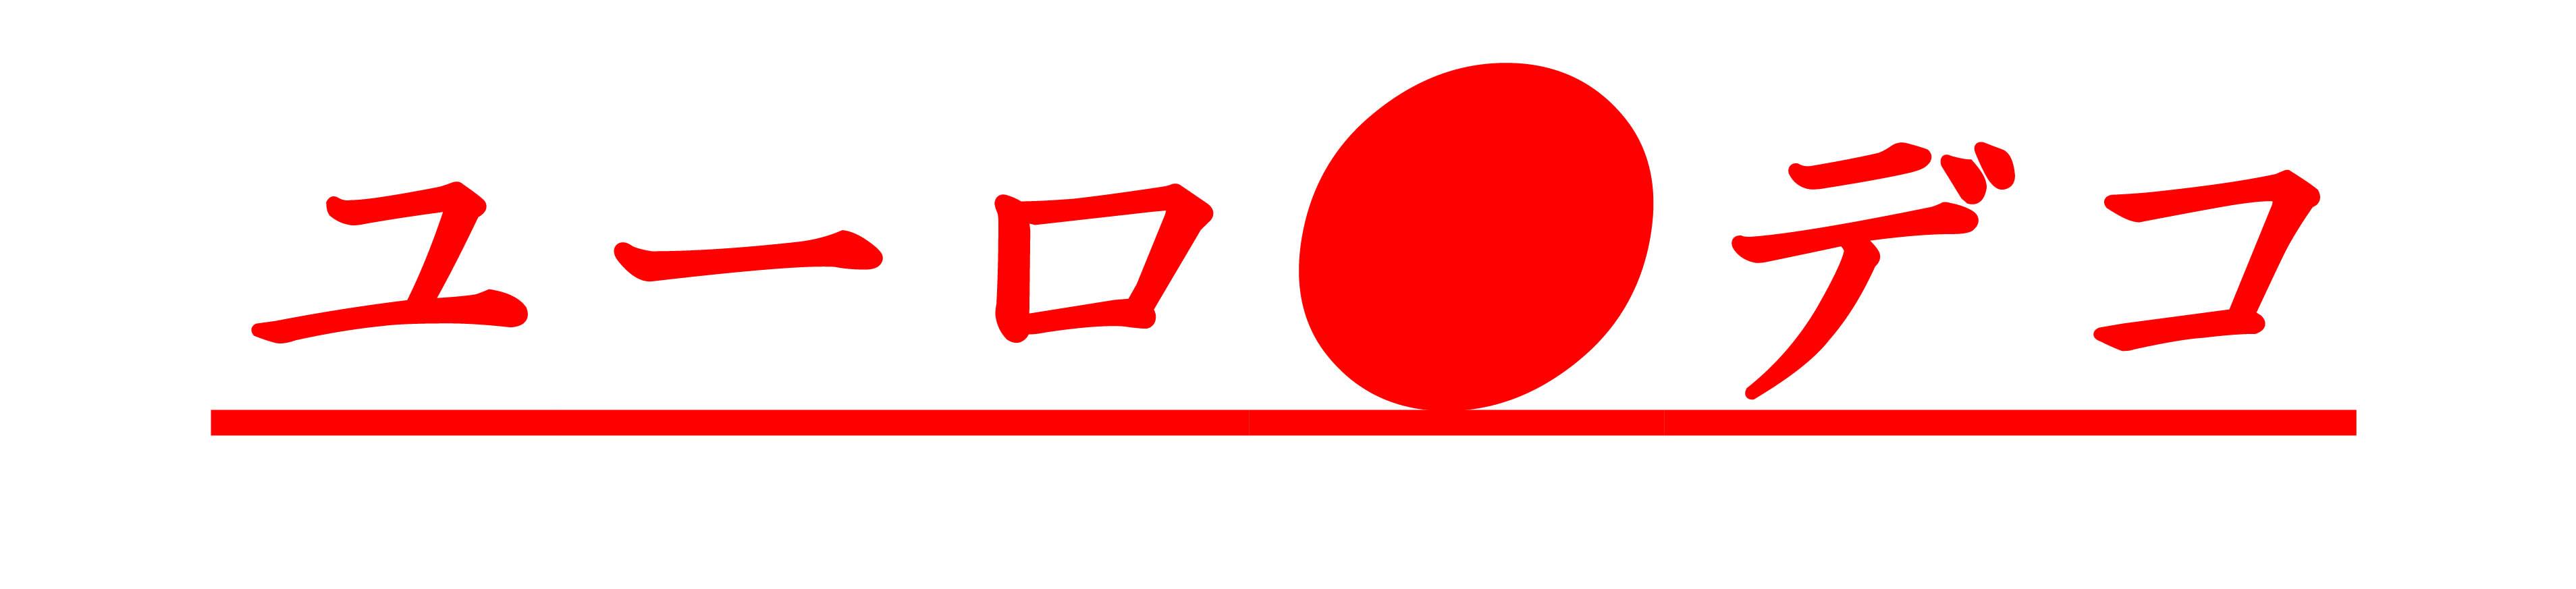 eurodeco